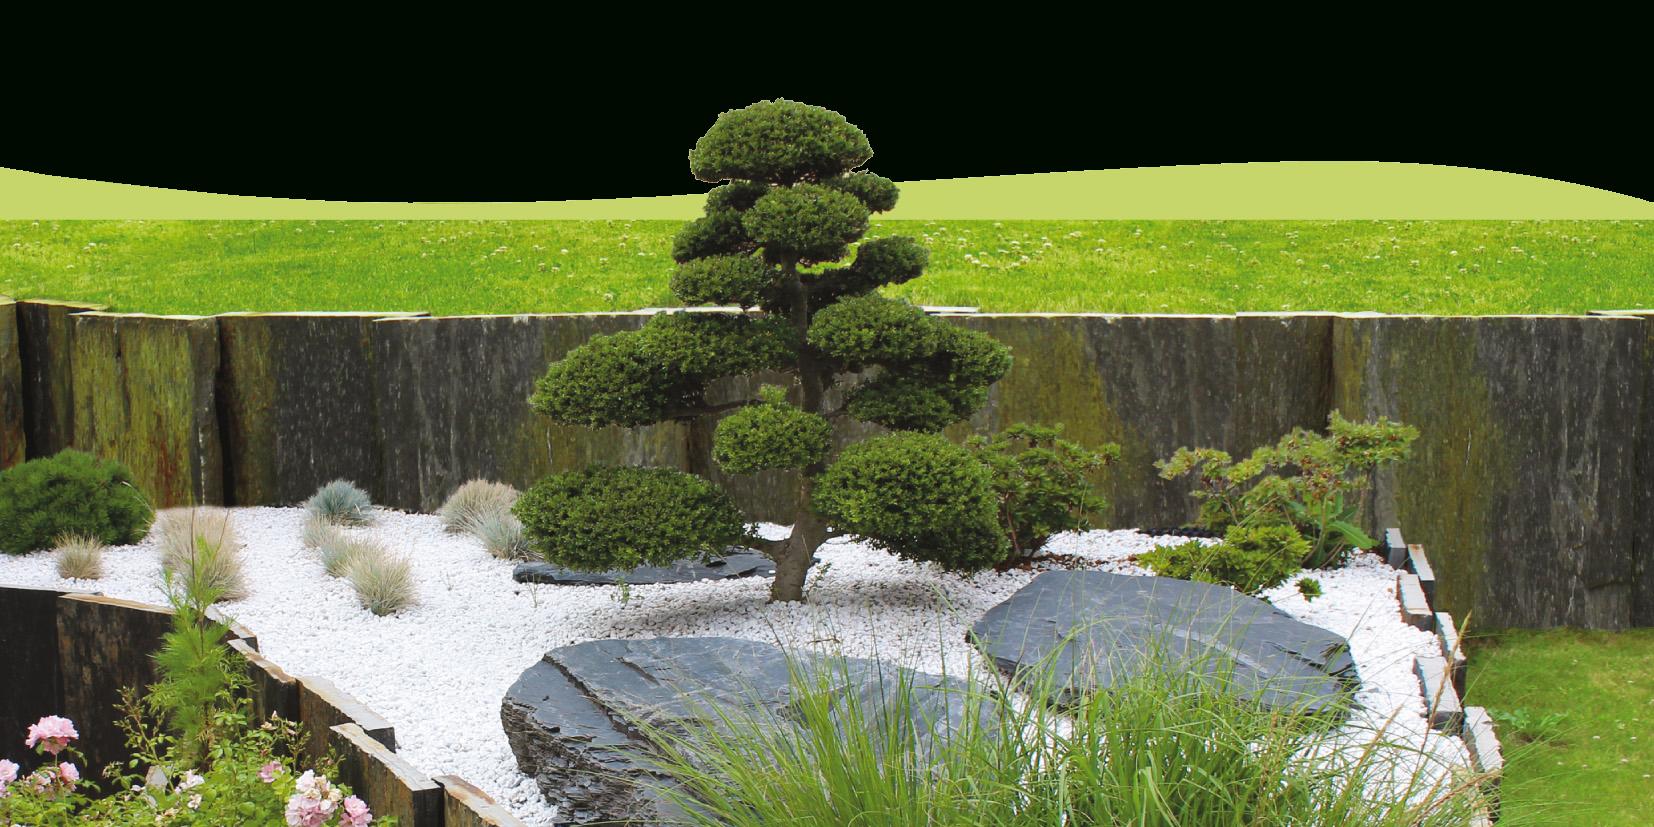 Jardinier Paysagiste, Aménagement Jardin – Jardins Décor 37 serapportantà Aménagement Du Jardin Photo